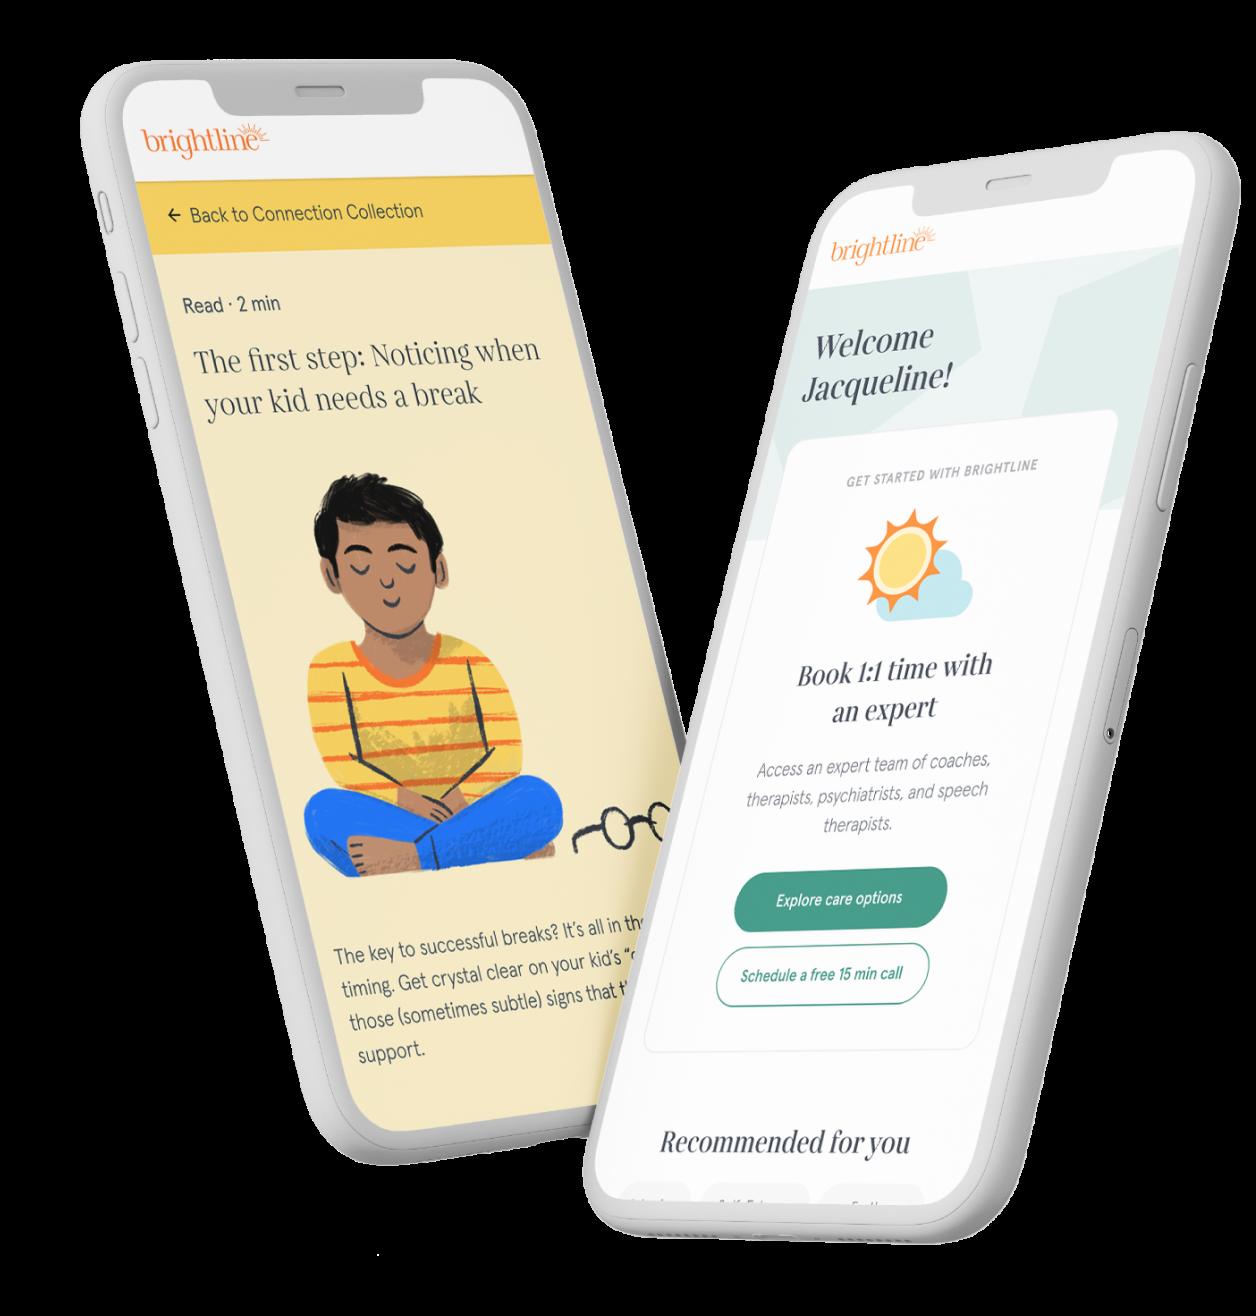 Two phones with Brightline website